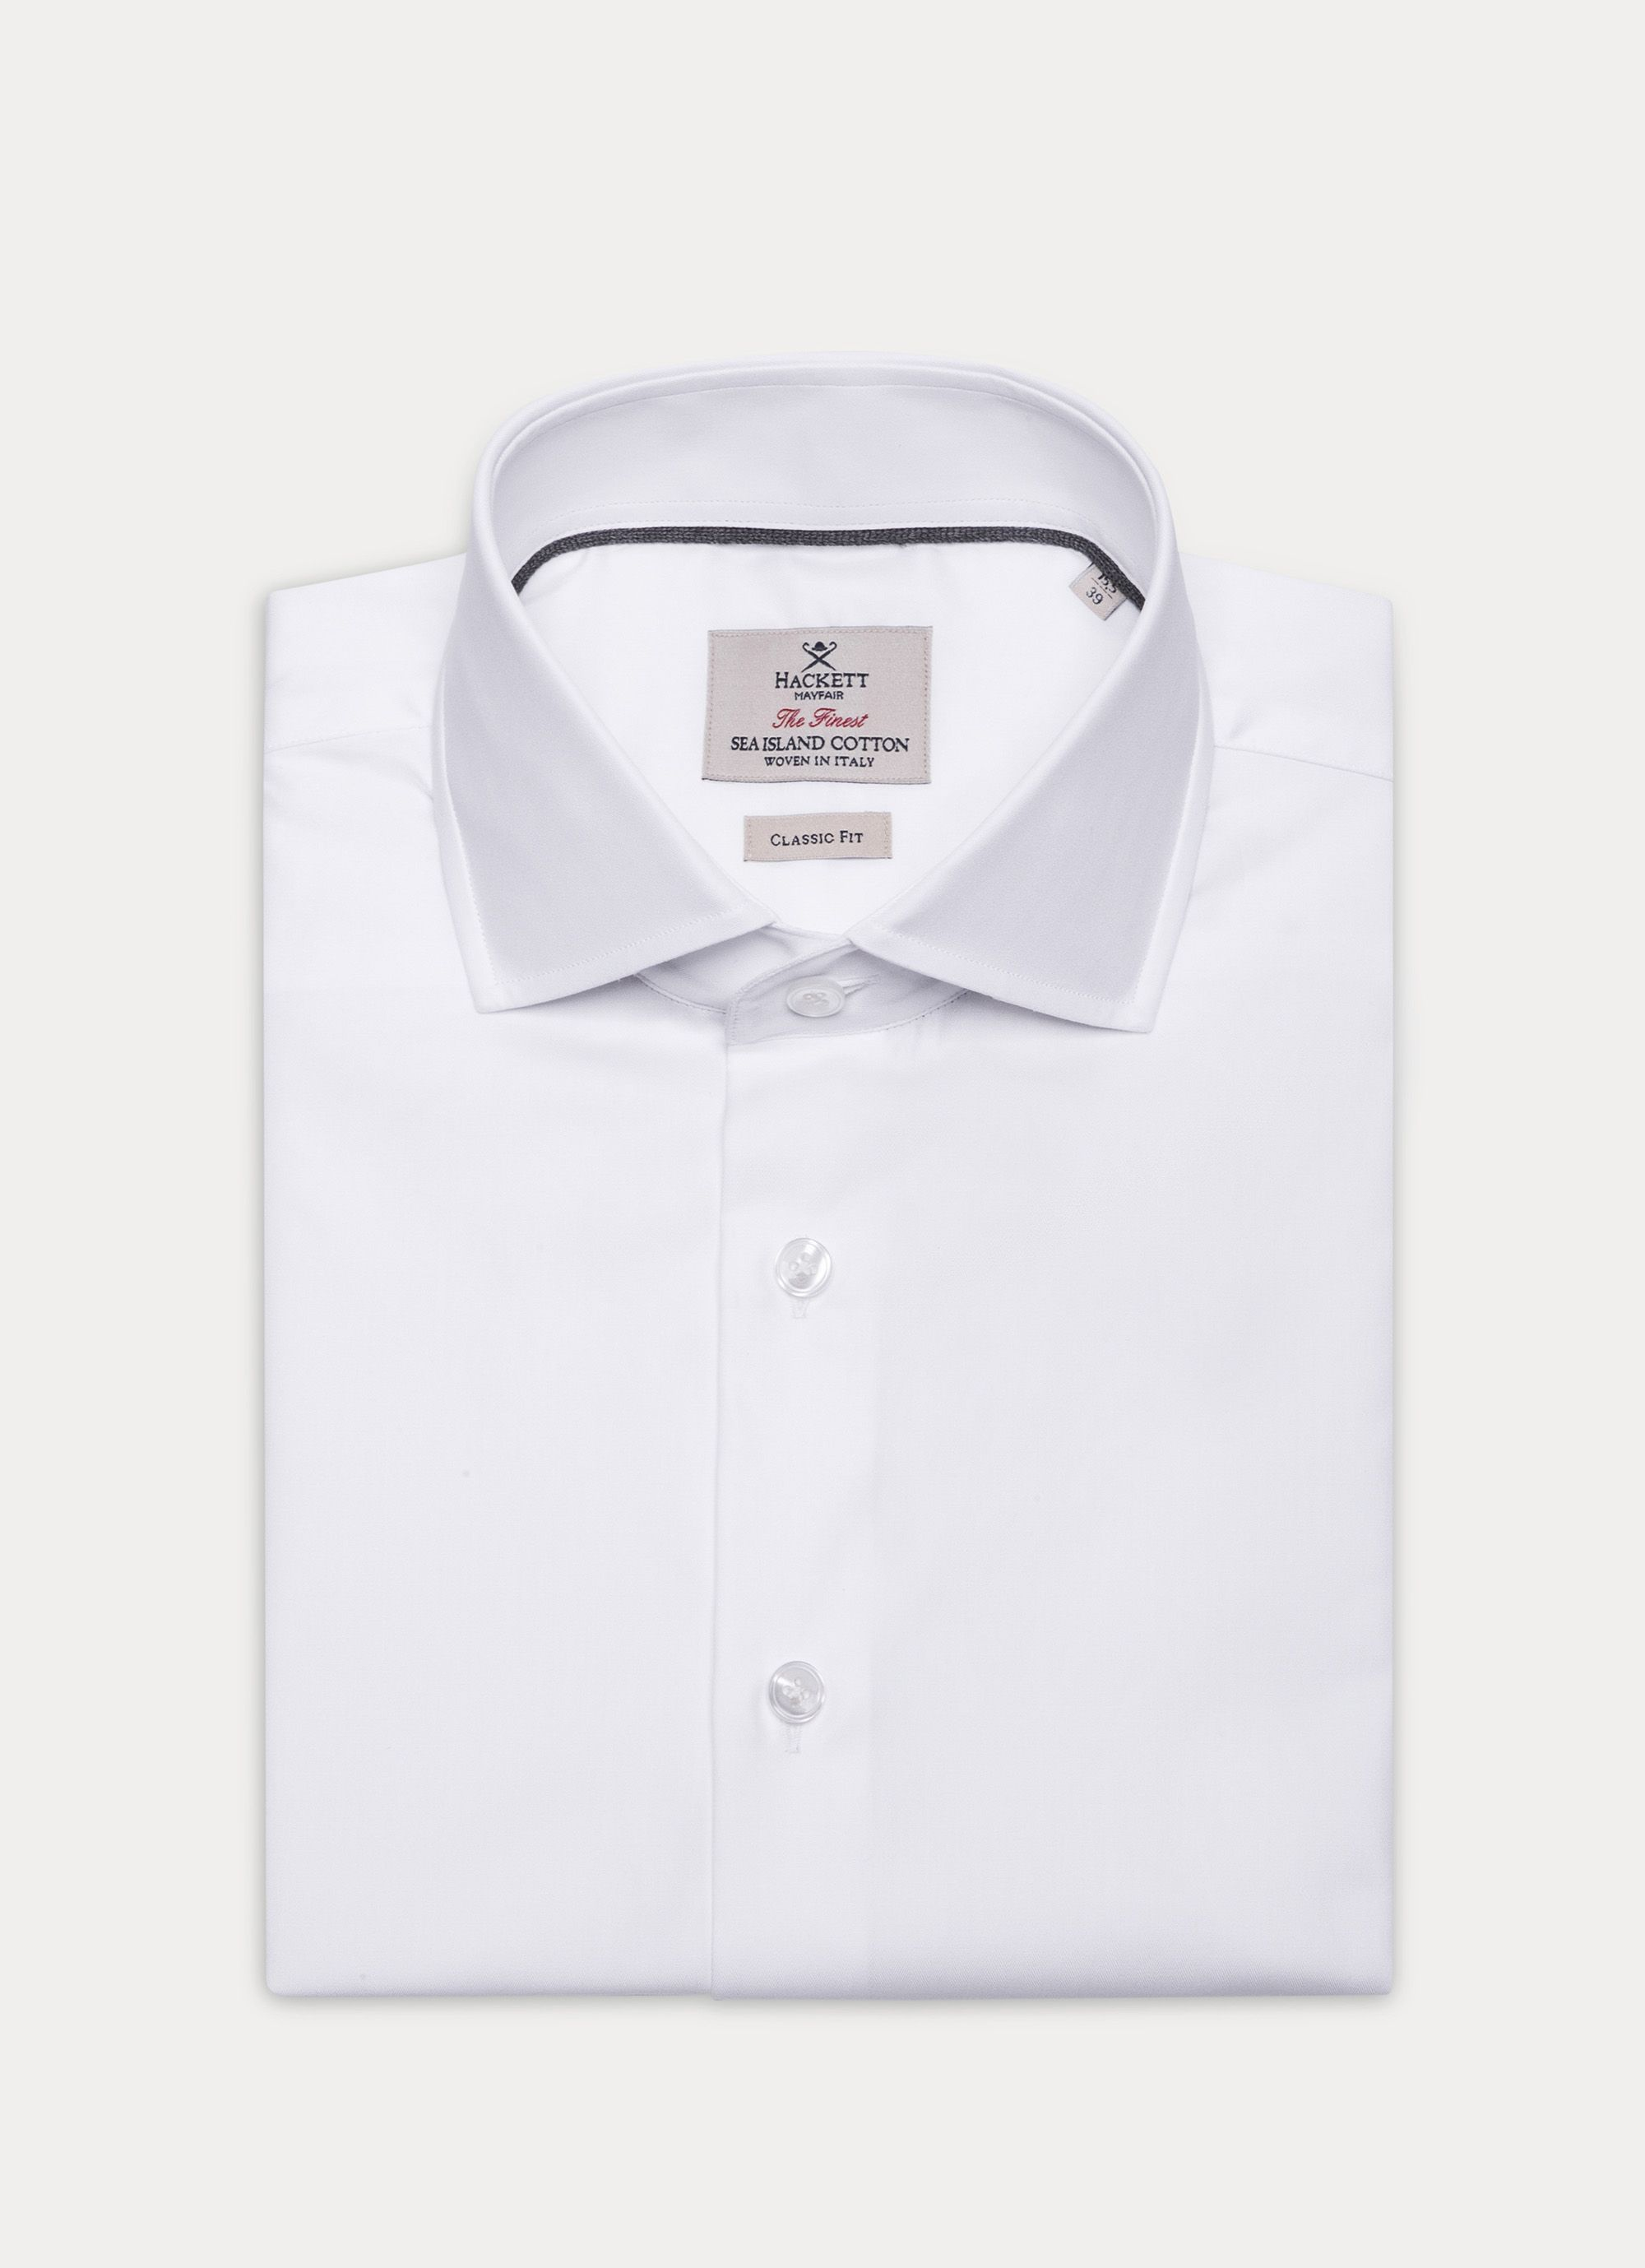 Hackett Luxurious Sea Island Cotton Shirt Hackett Cloth Hackett